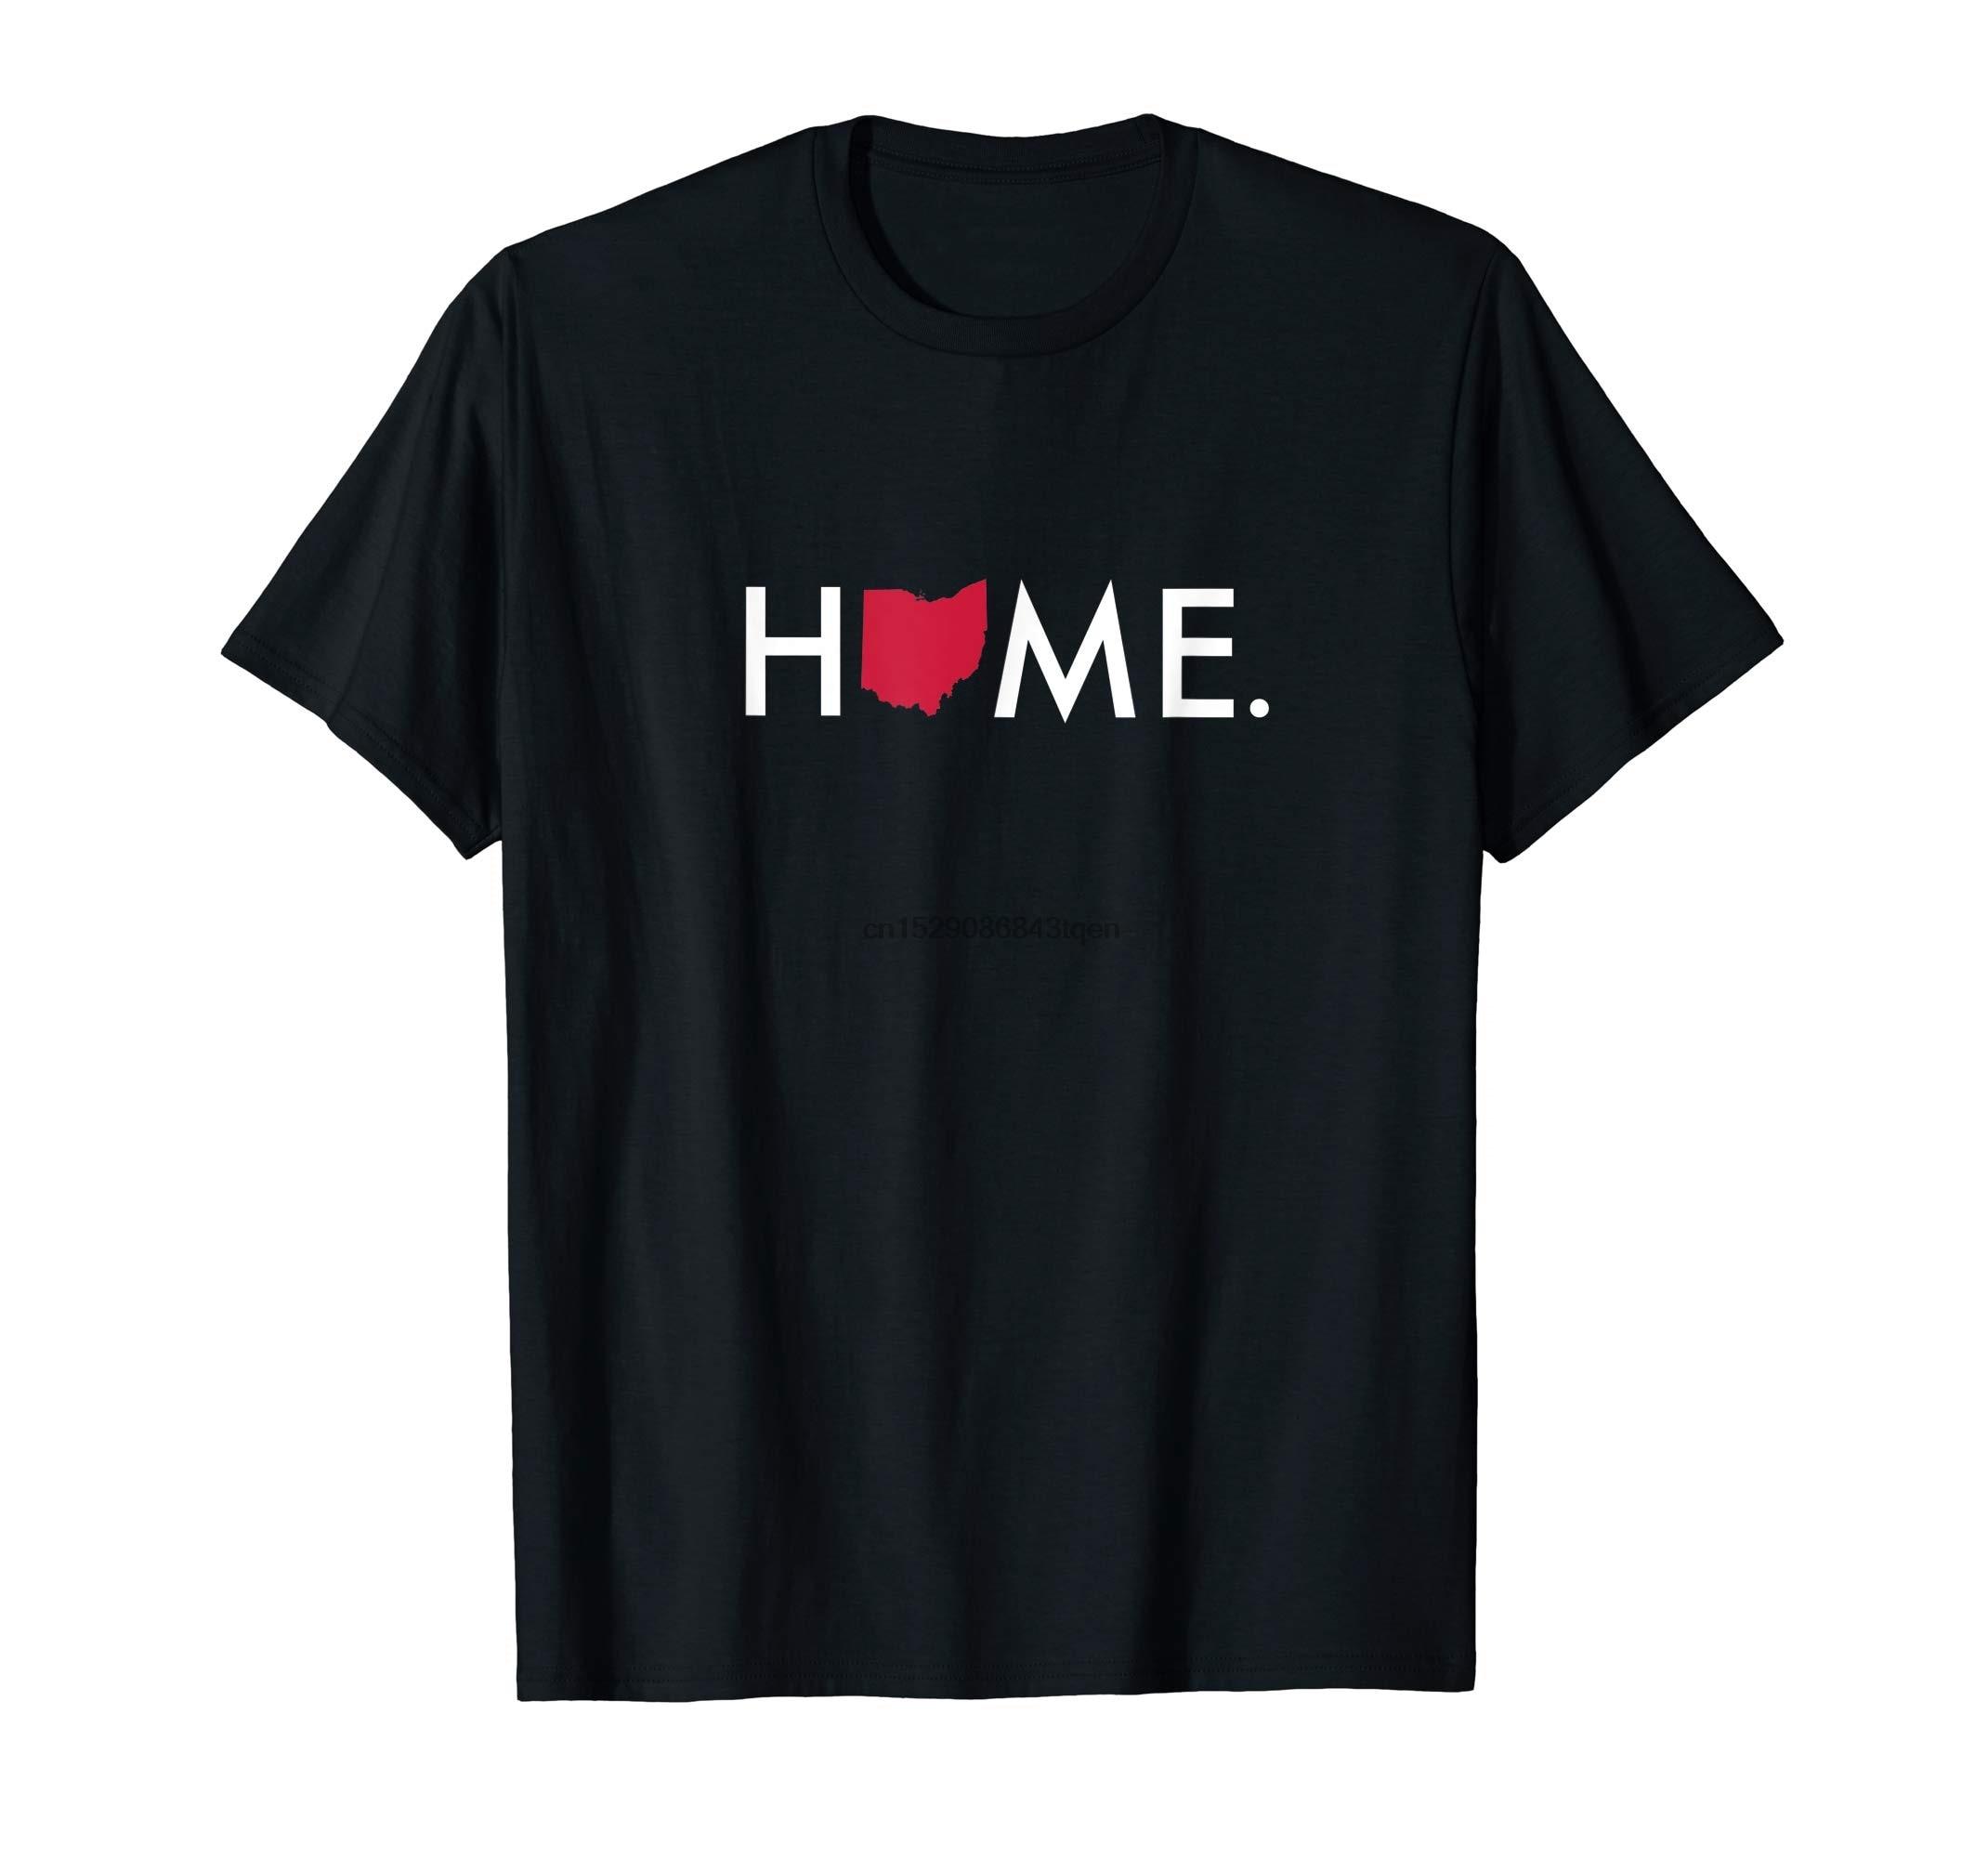 Camiseta de estado de Casa de Ohio, camiseta de hombre, negro